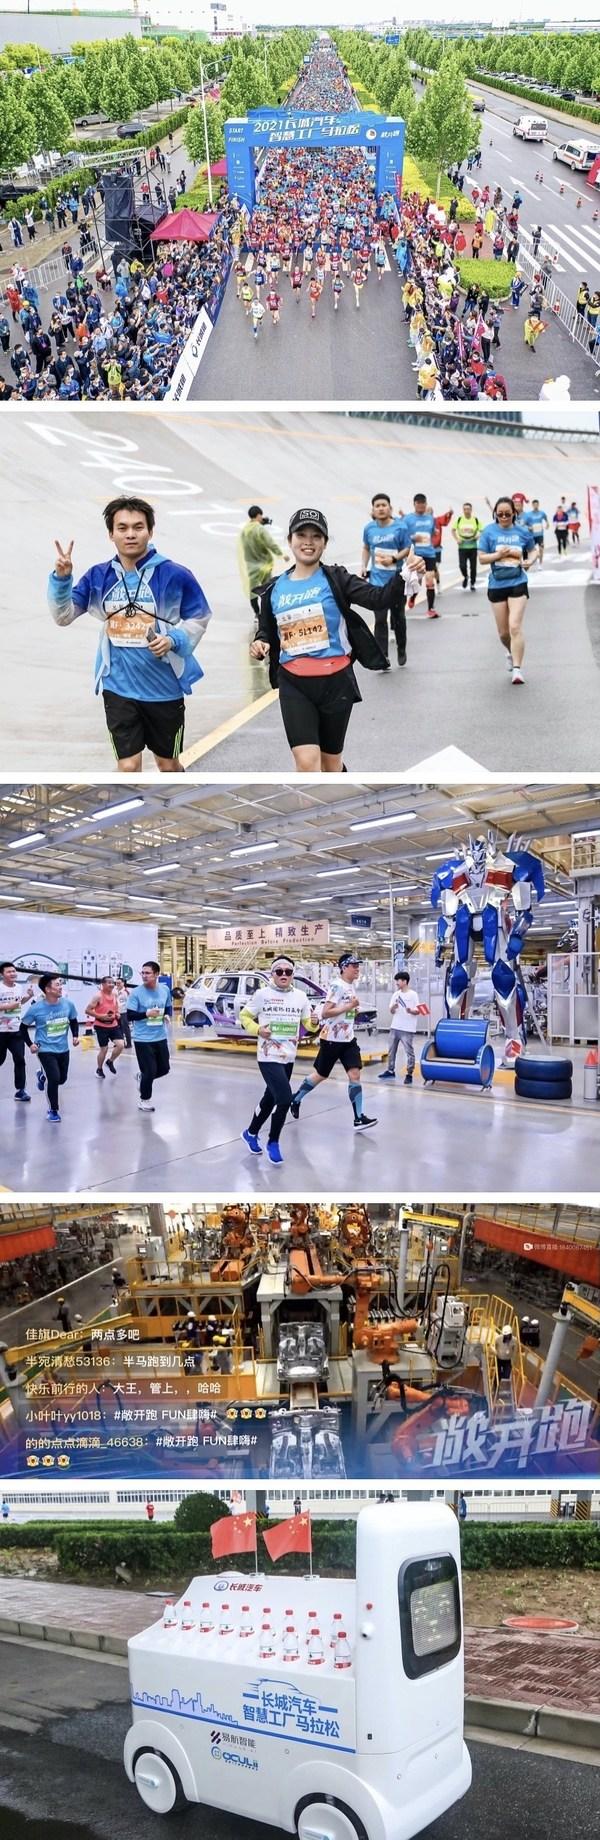 GWM, 자사 스마트 공장에서 마라톤 대회 개최